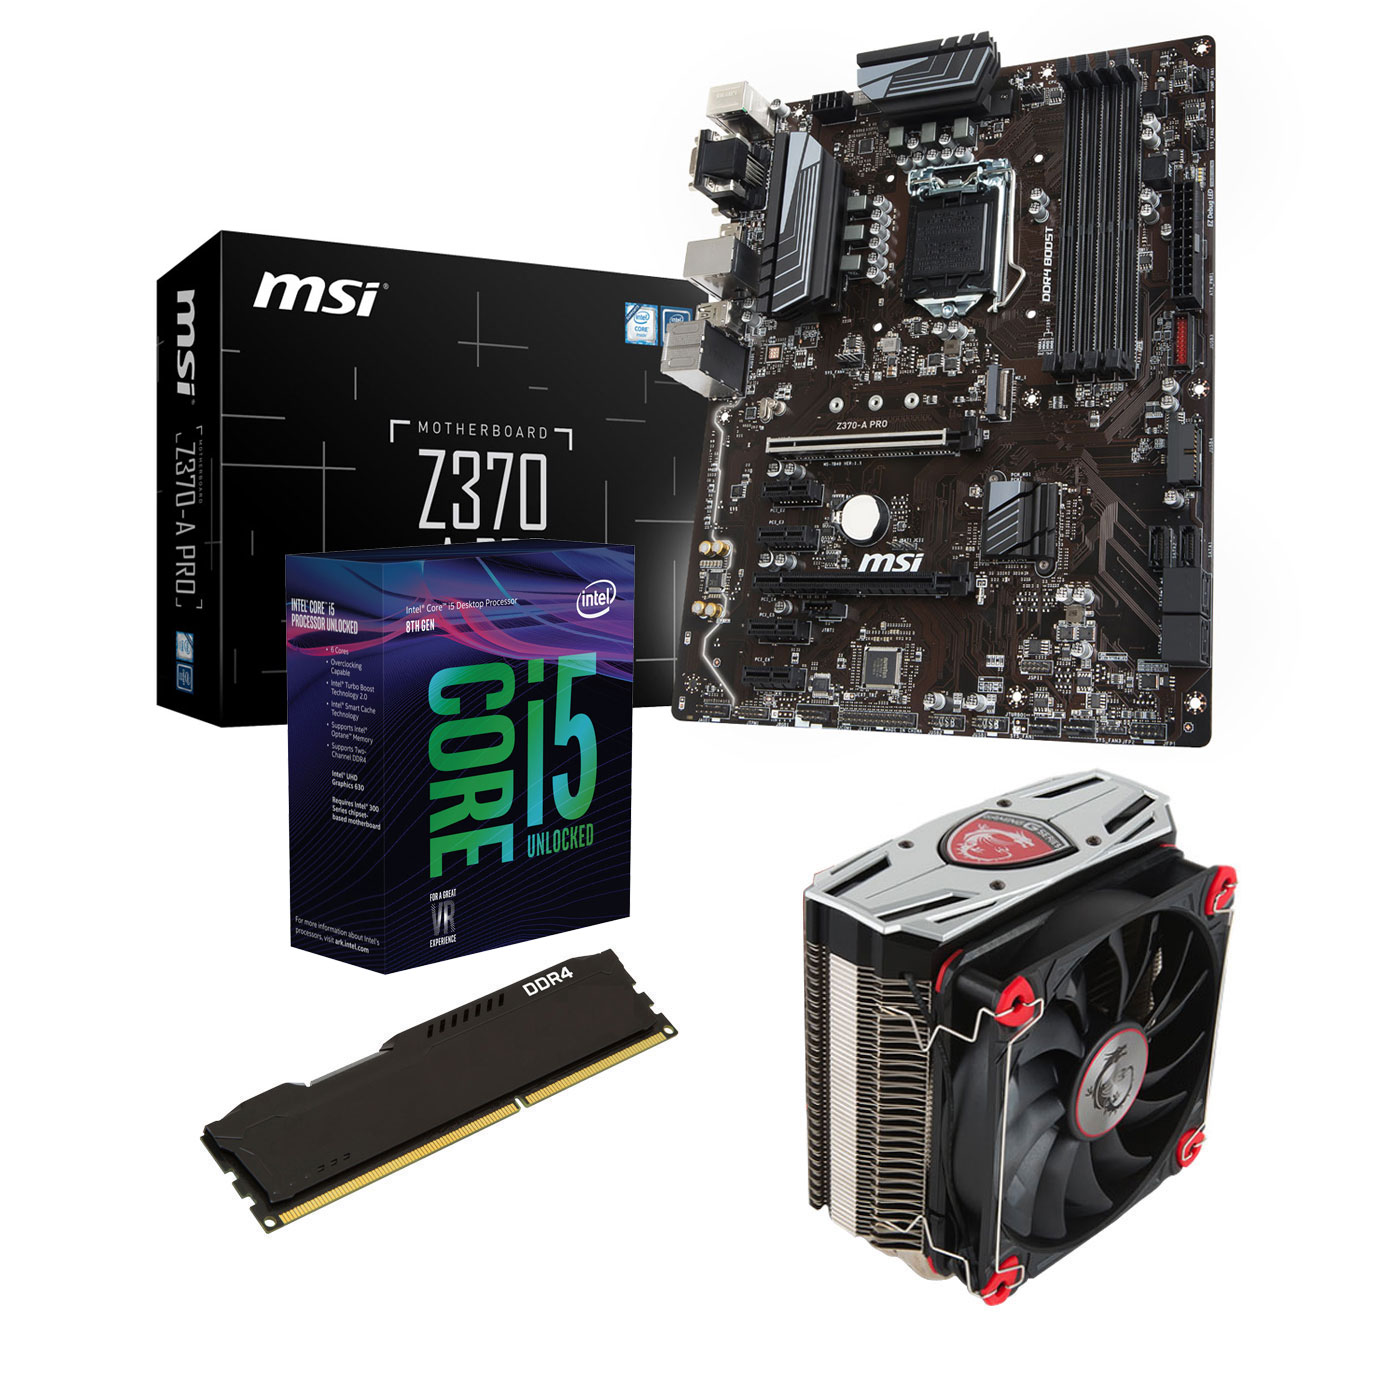 Kit upgrade PC Kit Upgrade PC Core i5K MSI Z370-A PRO 8 Go Carte mère Socket 1151 Intel Z370 Express + CPU Intel Core i5-8600K (3.6 GHz) + RAM 8 Go DDR4